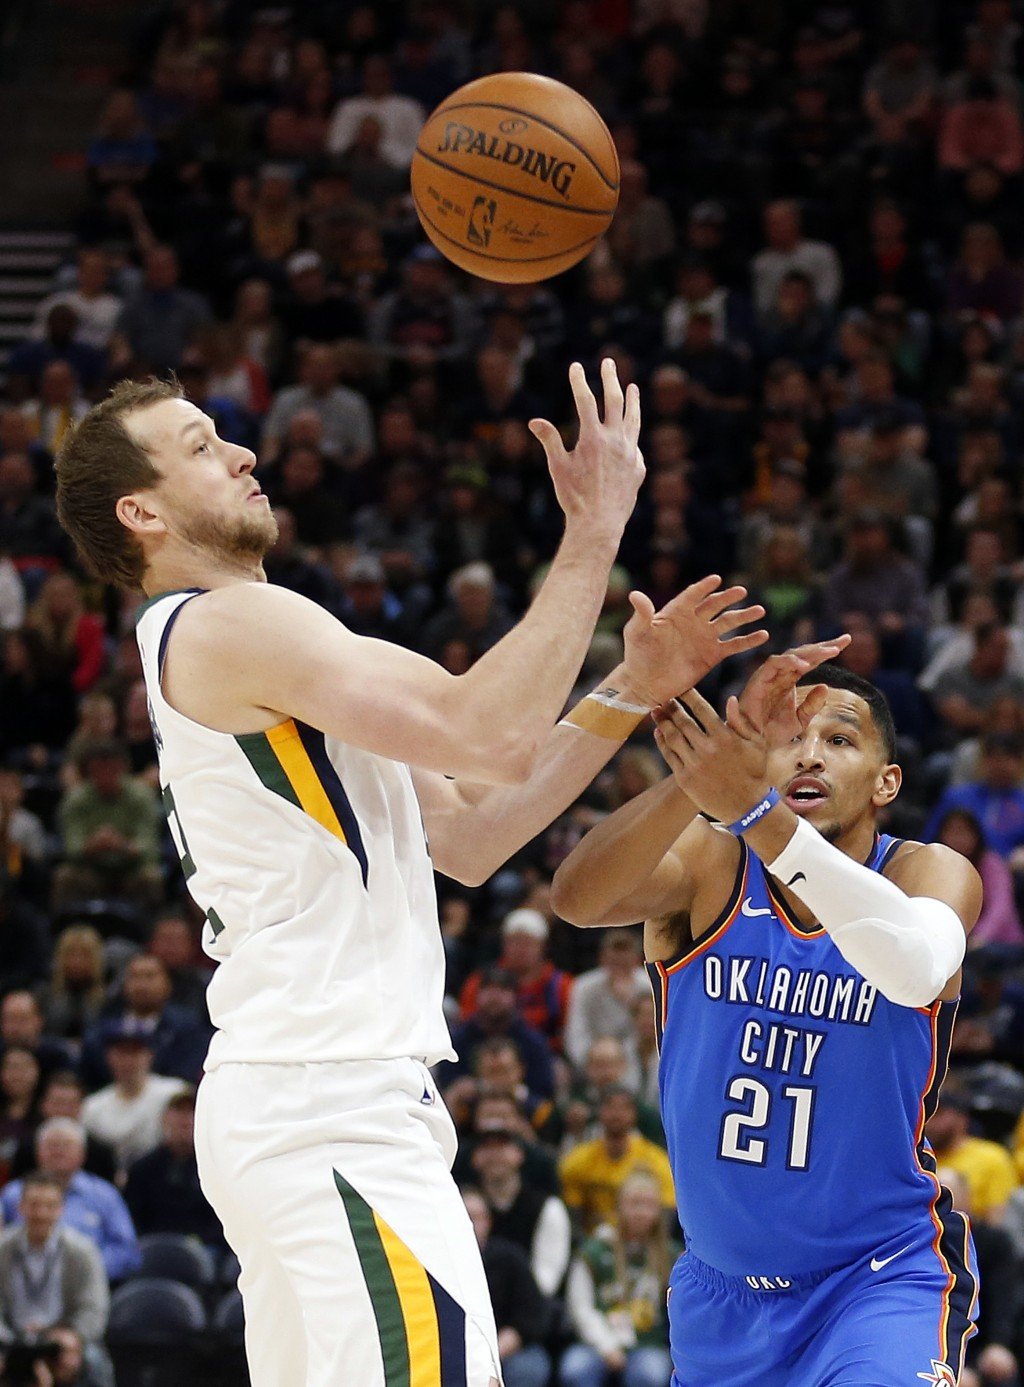 Utah Jazz forward Joe Ingles, left, knocks the ball away from Oklahoma City Thunder guard Andre Roberson (21) in the first half during an NBA basketba...